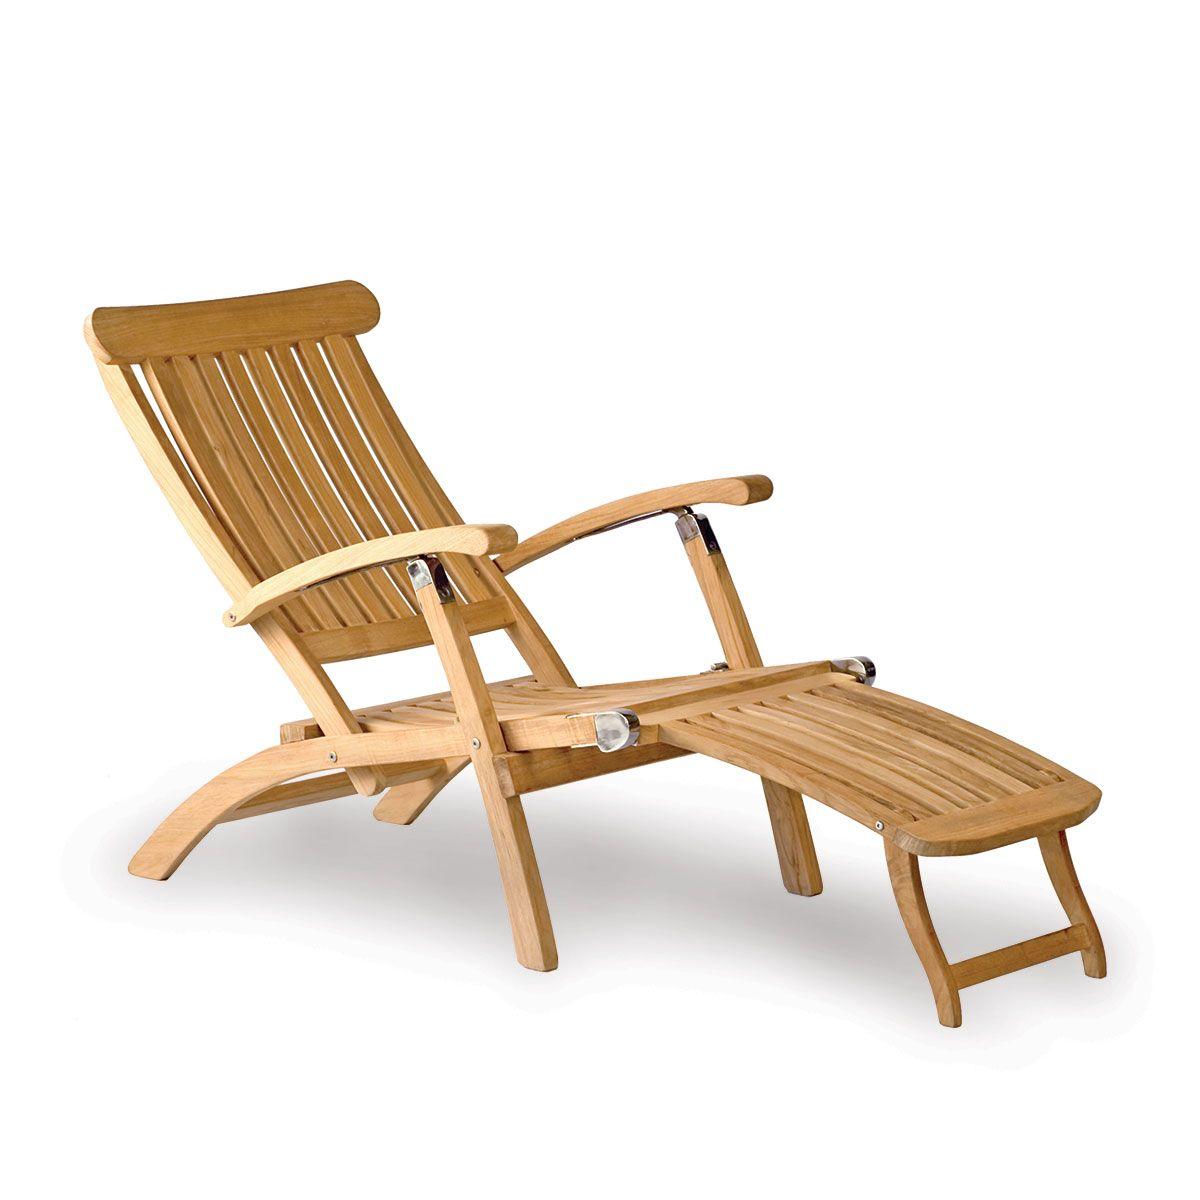 Incredible Classic Teak Steamer Chair Deck Chairs Teak Adirondack Theyellowbook Wood Chair Design Ideas Theyellowbookinfo